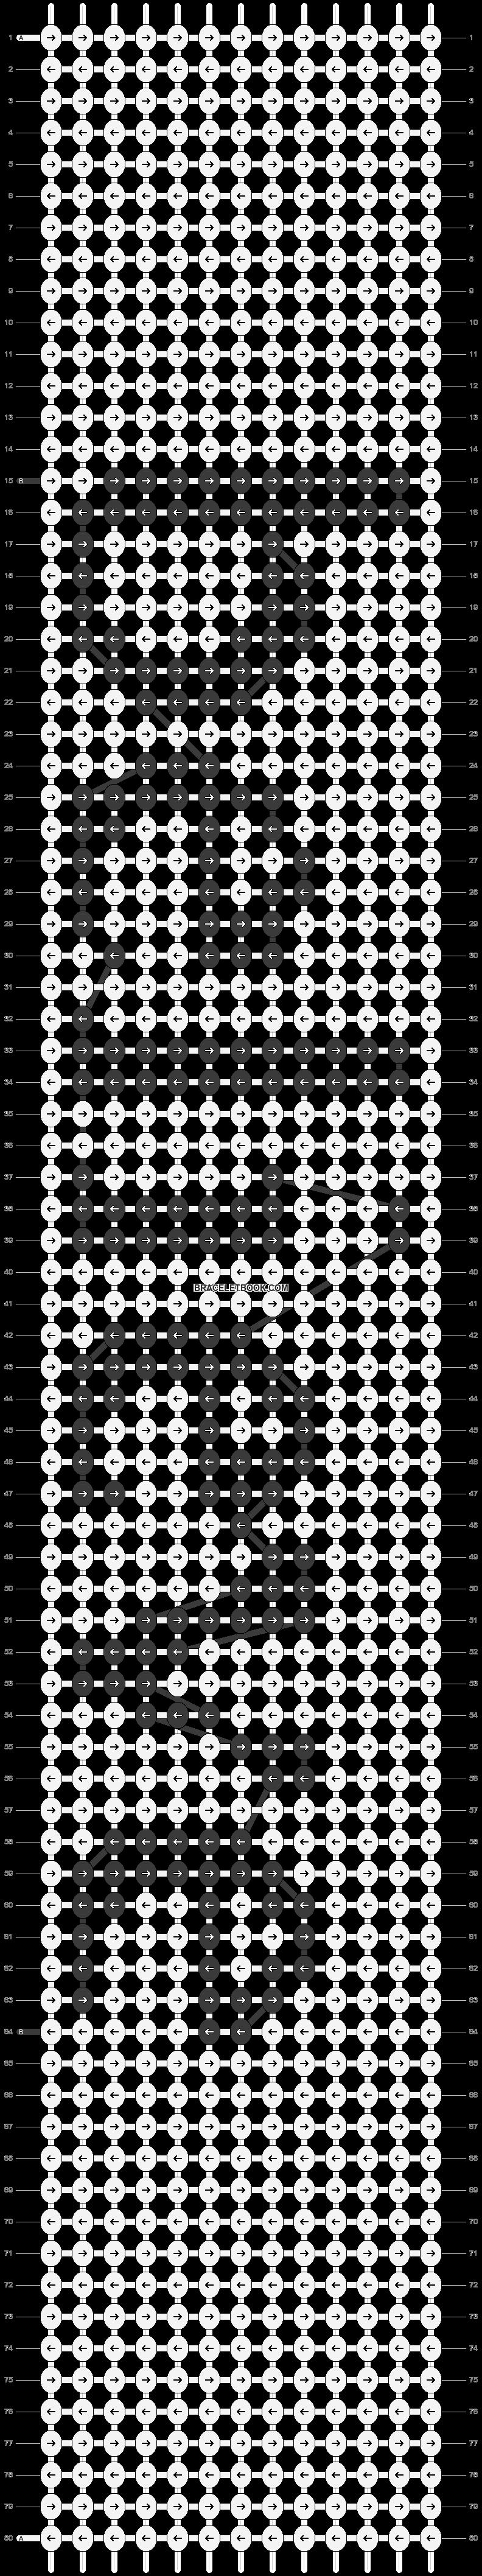 Alpha pattern #6480 pattern